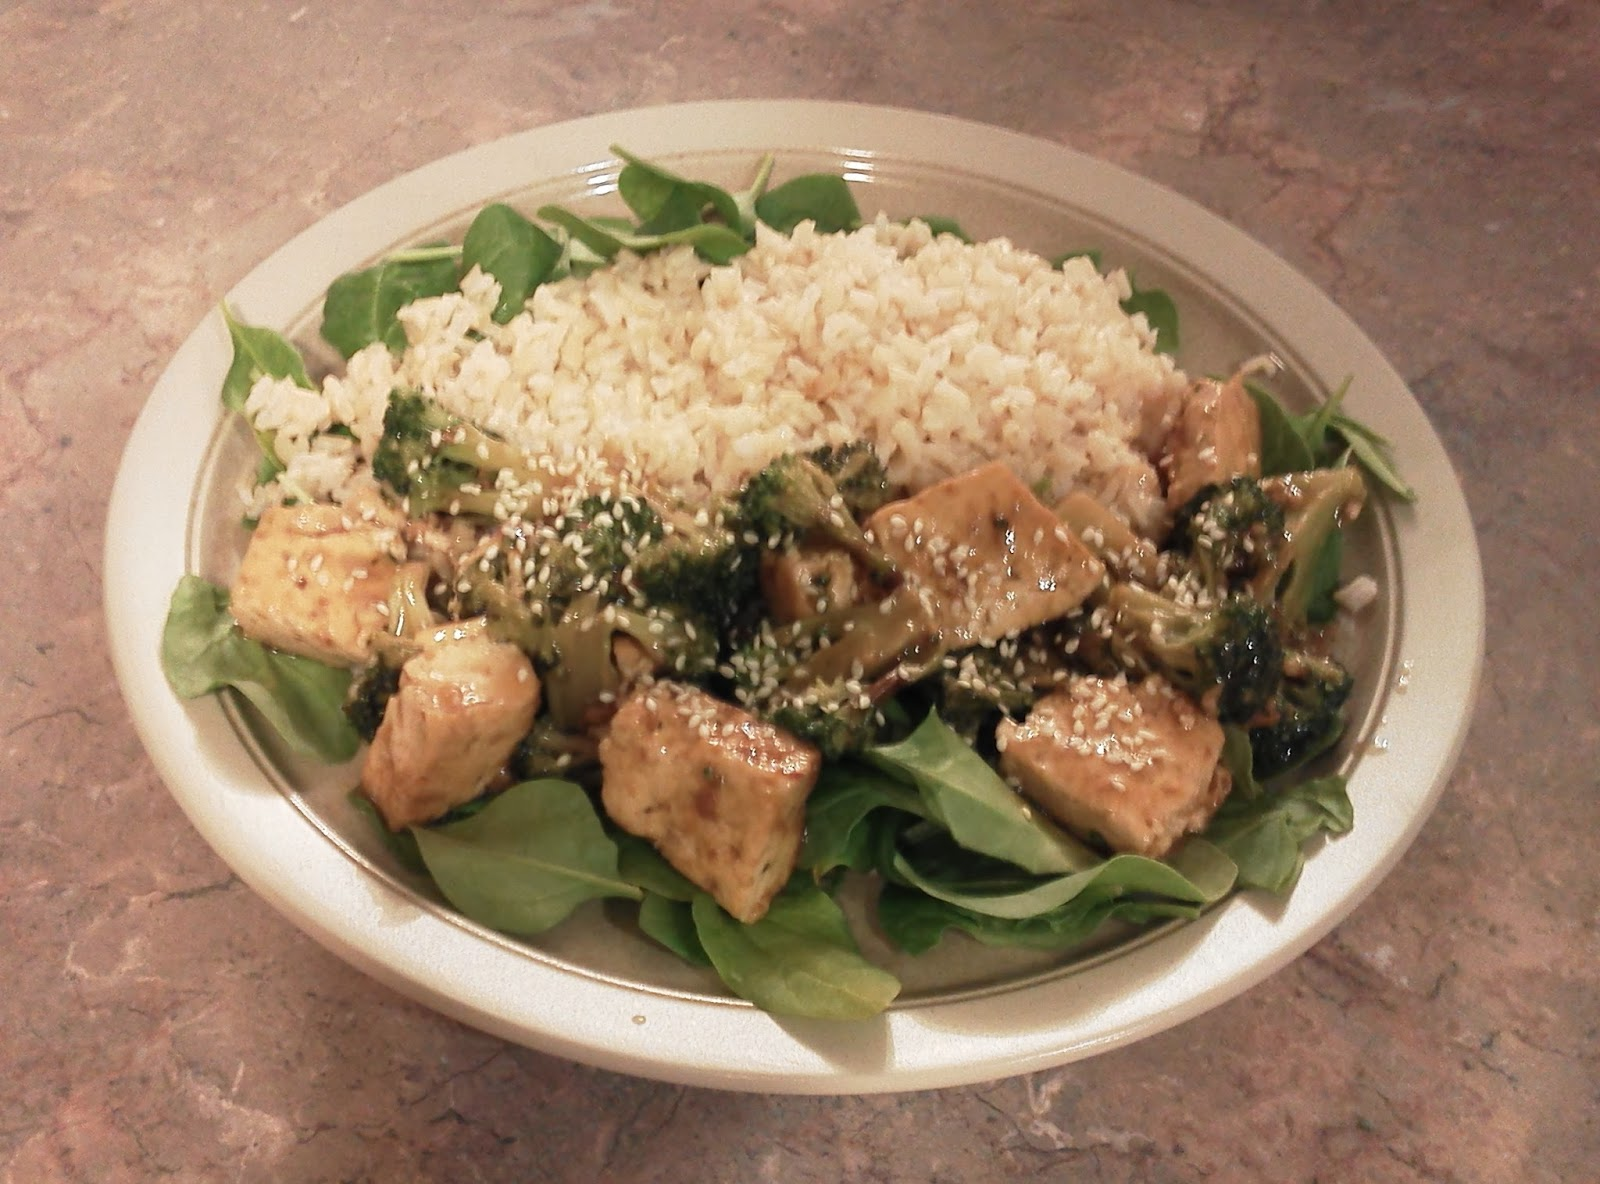 Pocono Pabulum for Mind & Body: Broccoli and Tofu Stir Fry